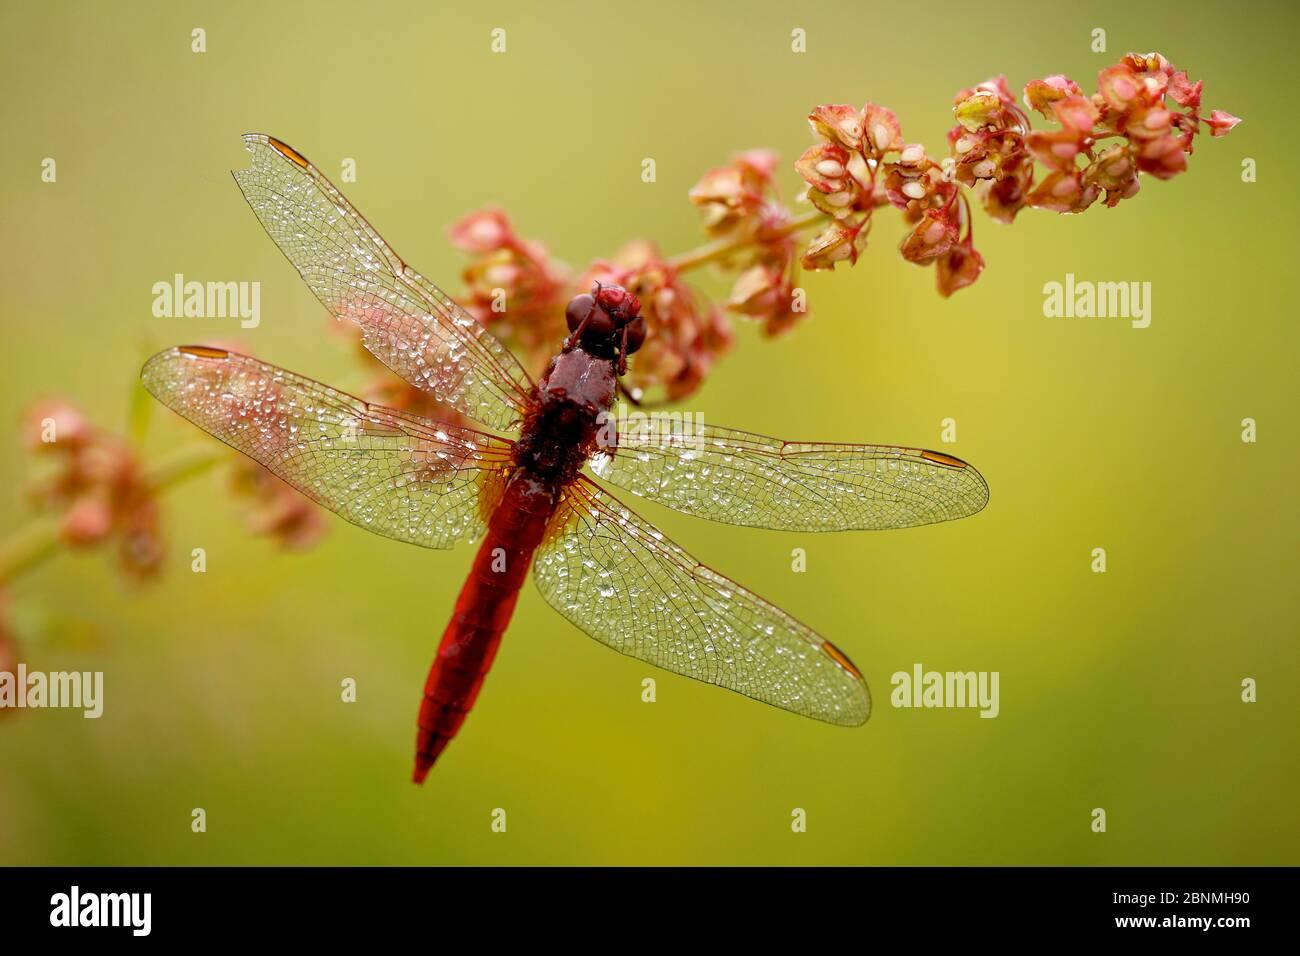 Male Scarlet dragonfly (Crocothemis erythraea) covered in dew, La Brenne Regional Natural Park, France, June. Stock Photo